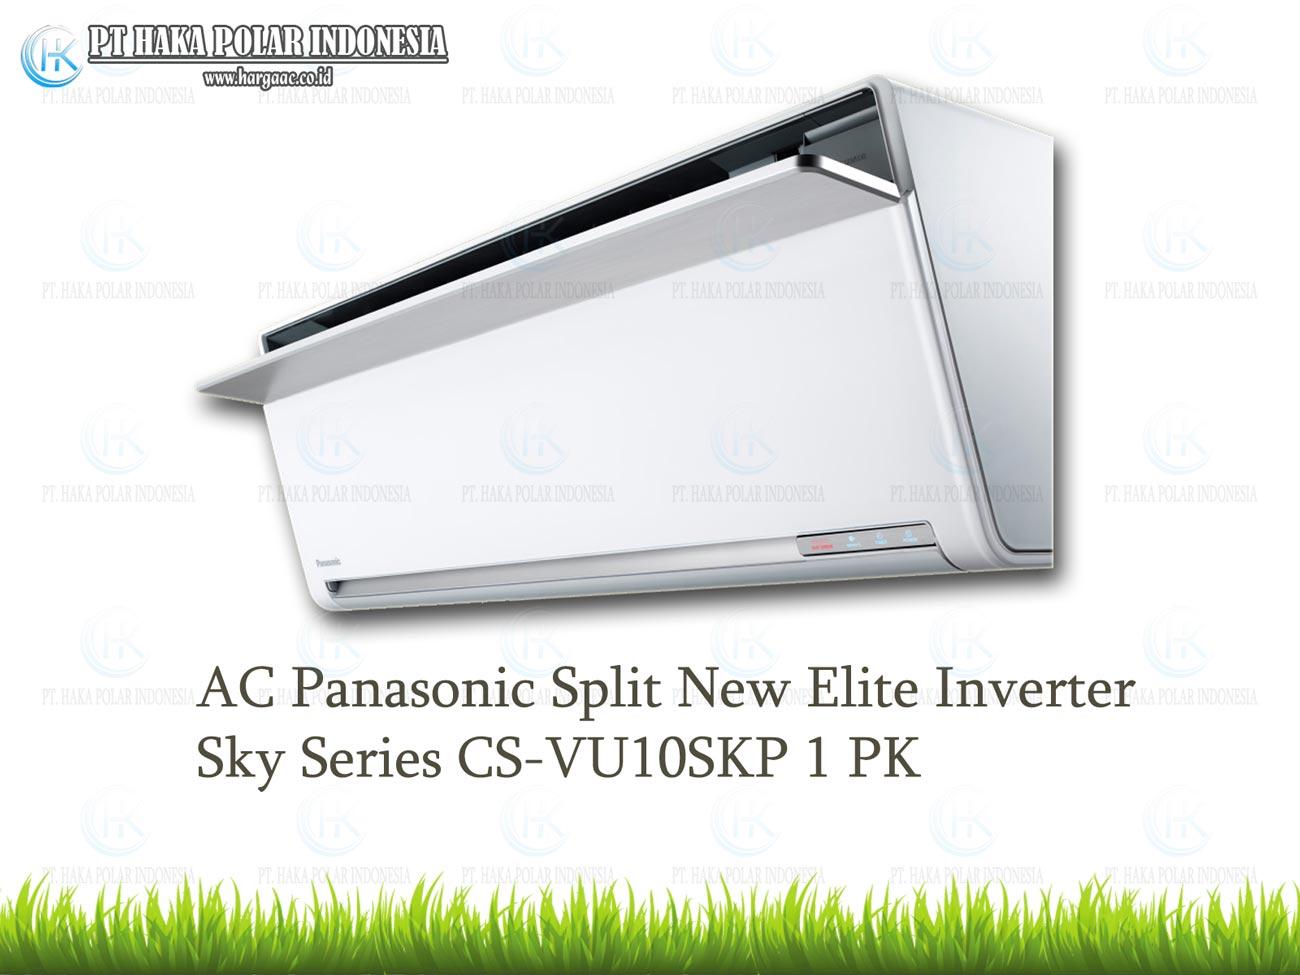 AC Panasonic CS VU10SKP 1 PK Split New Elite Inverter Sky